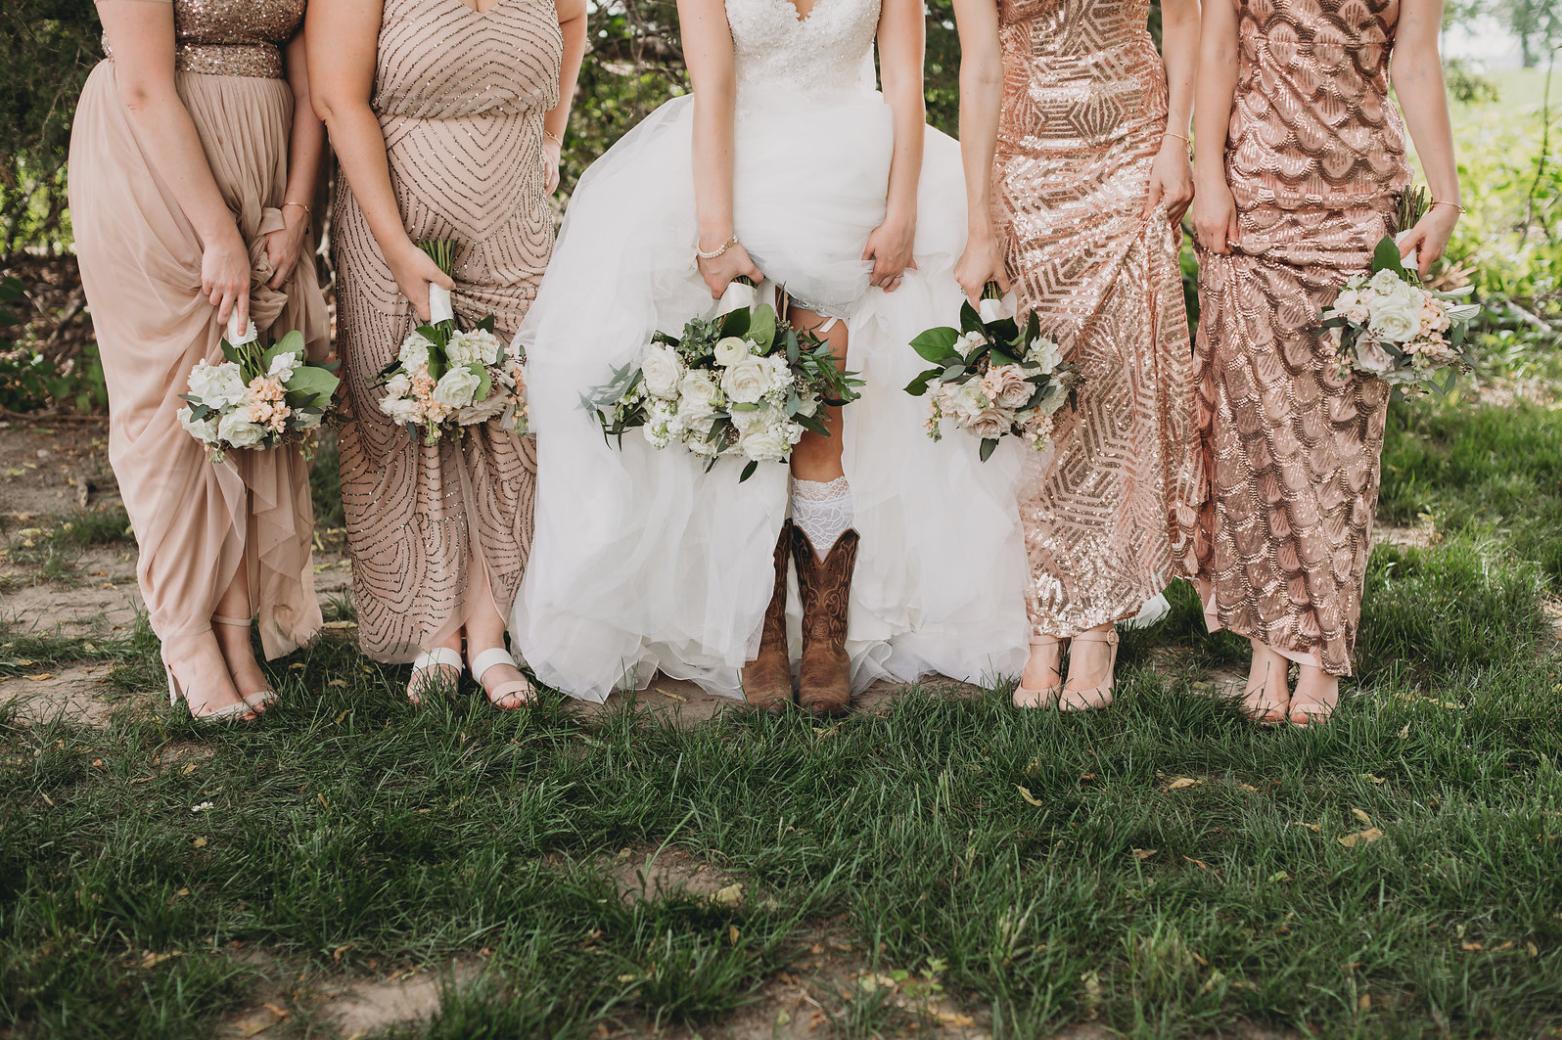 kc wedding florist boho style